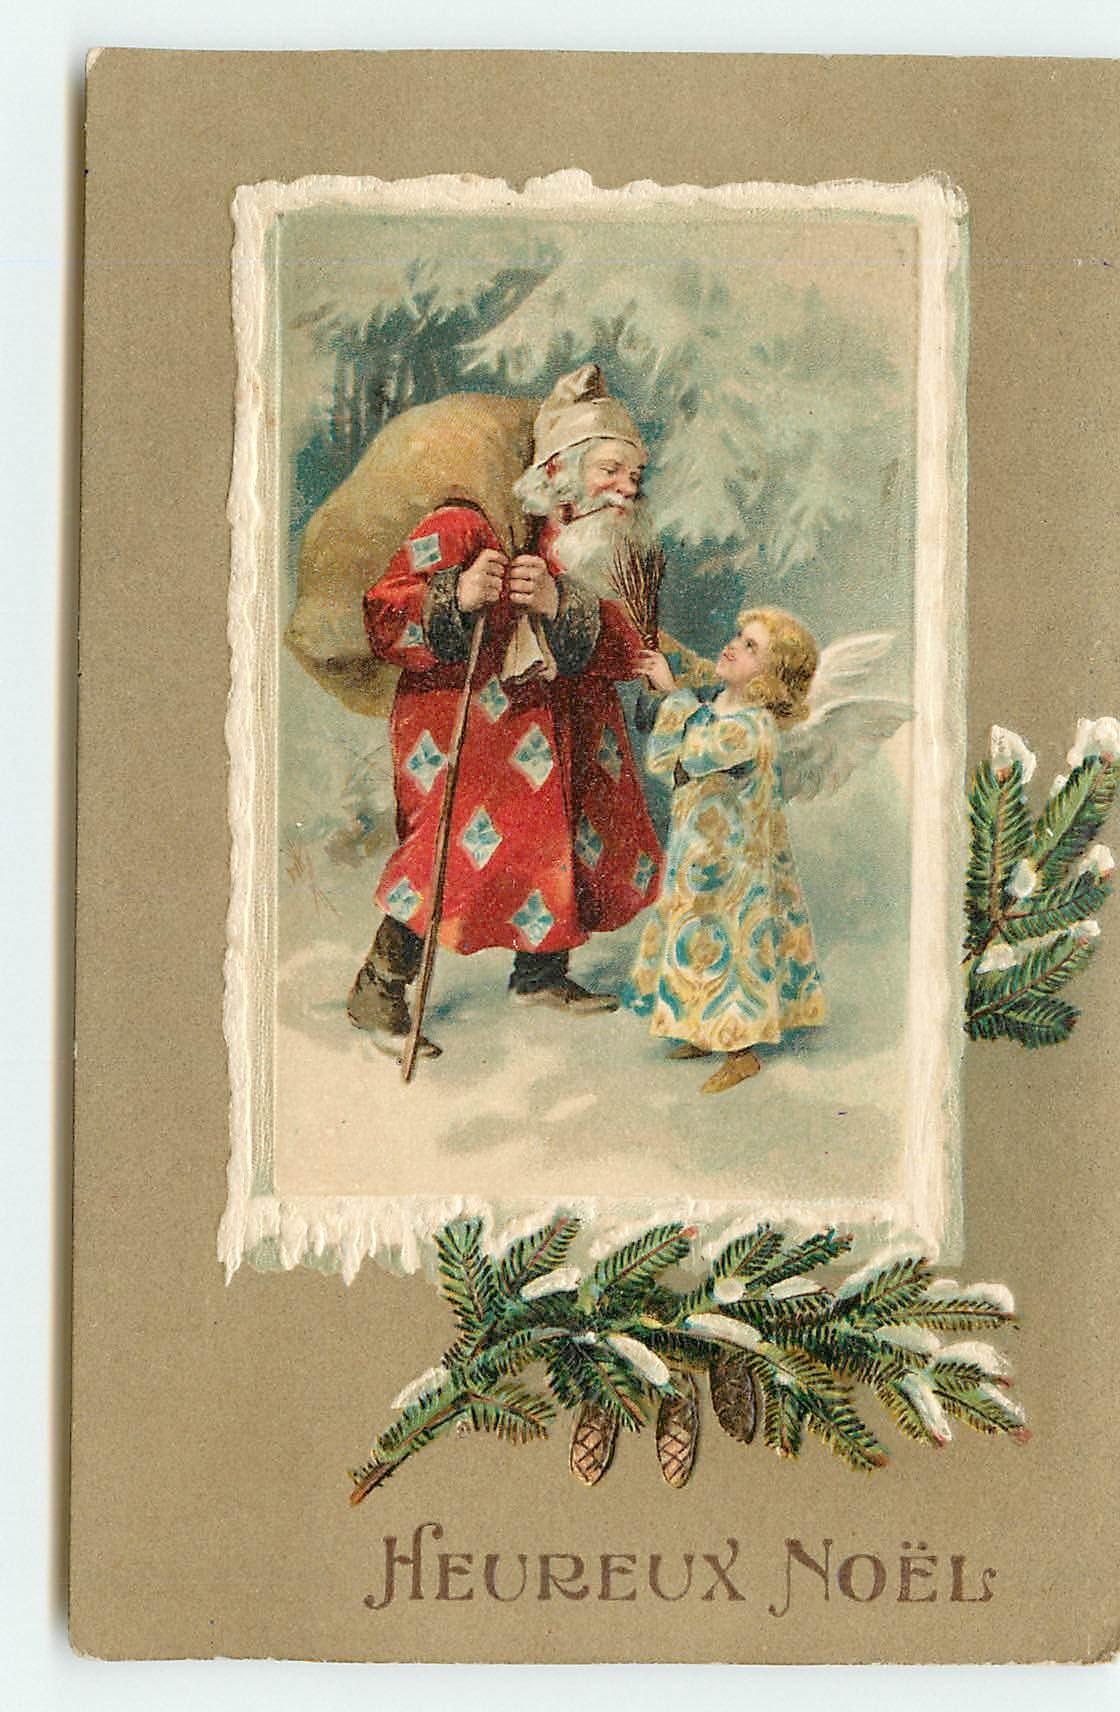 n°2086 - Heureux Noël - Angelot et Père Noël - Carte Postale Ancienne /  Beekollect